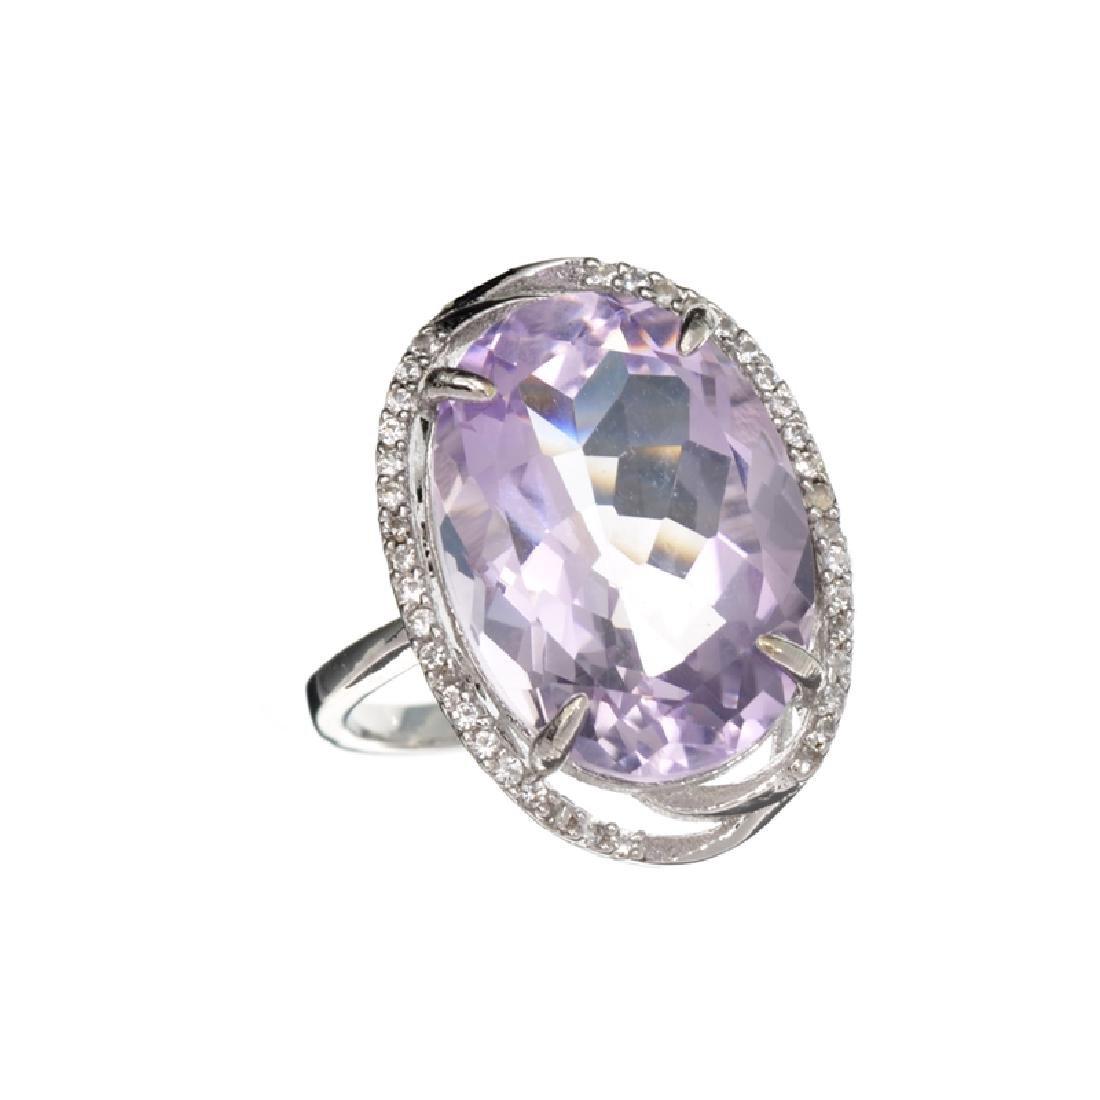 APP: 1.1k Fine Jewelry 11.50CT Purple Amethyst And